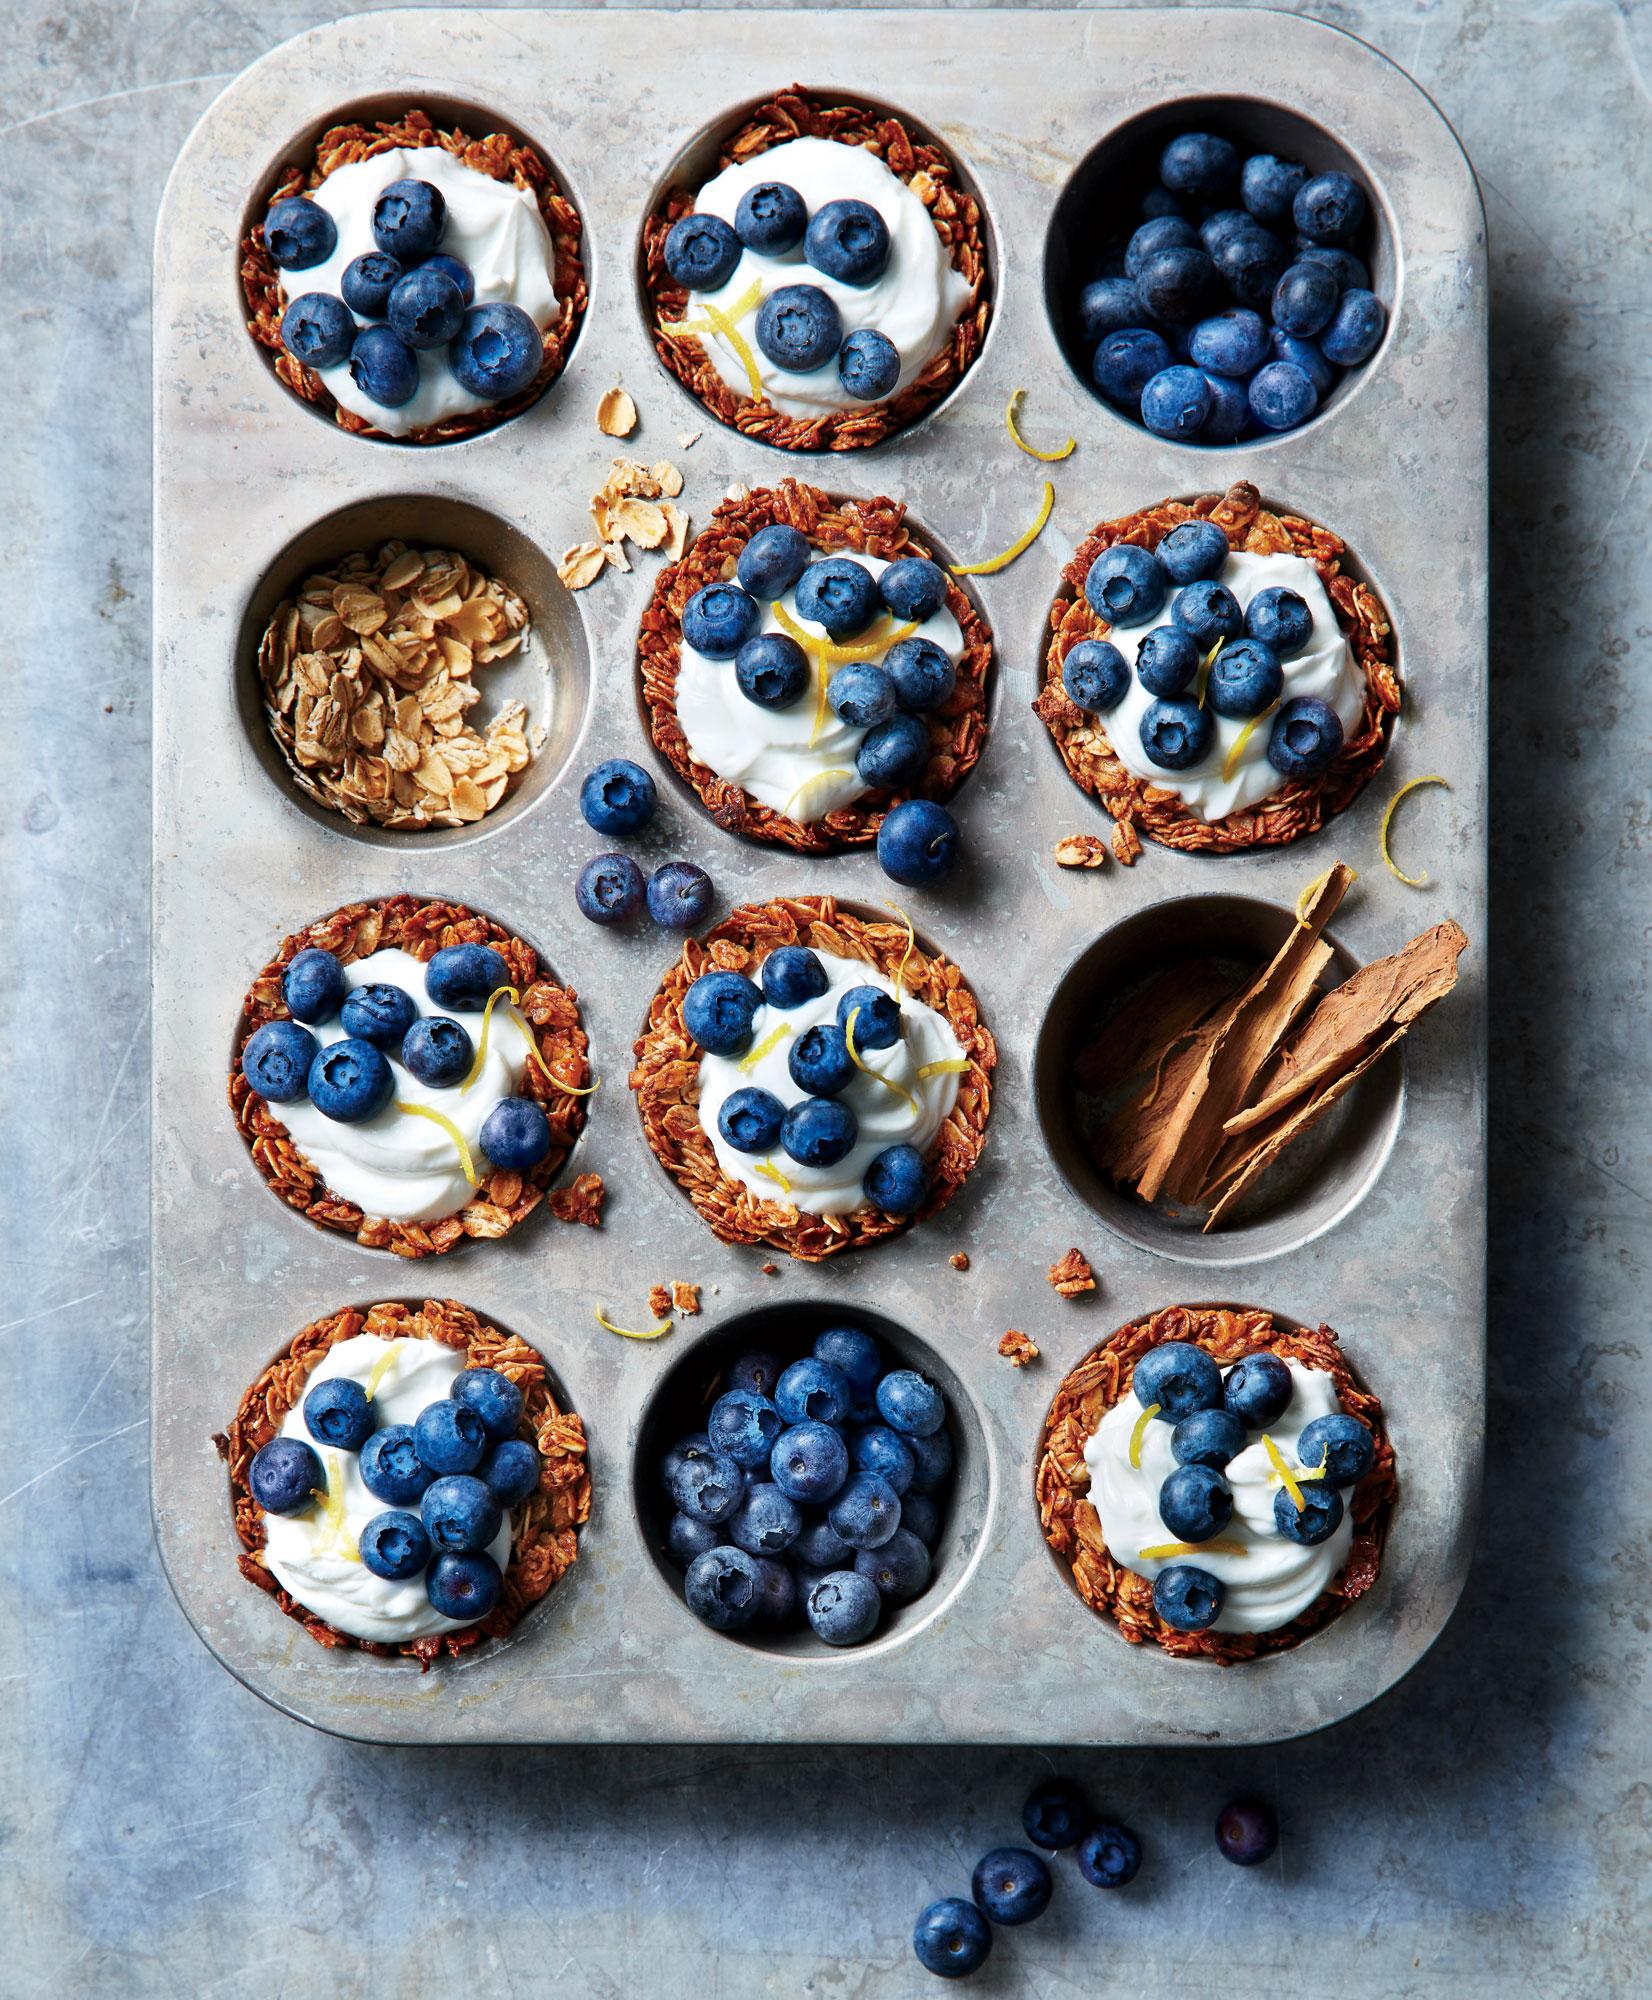 Granola Cups with Yogurt and Berries